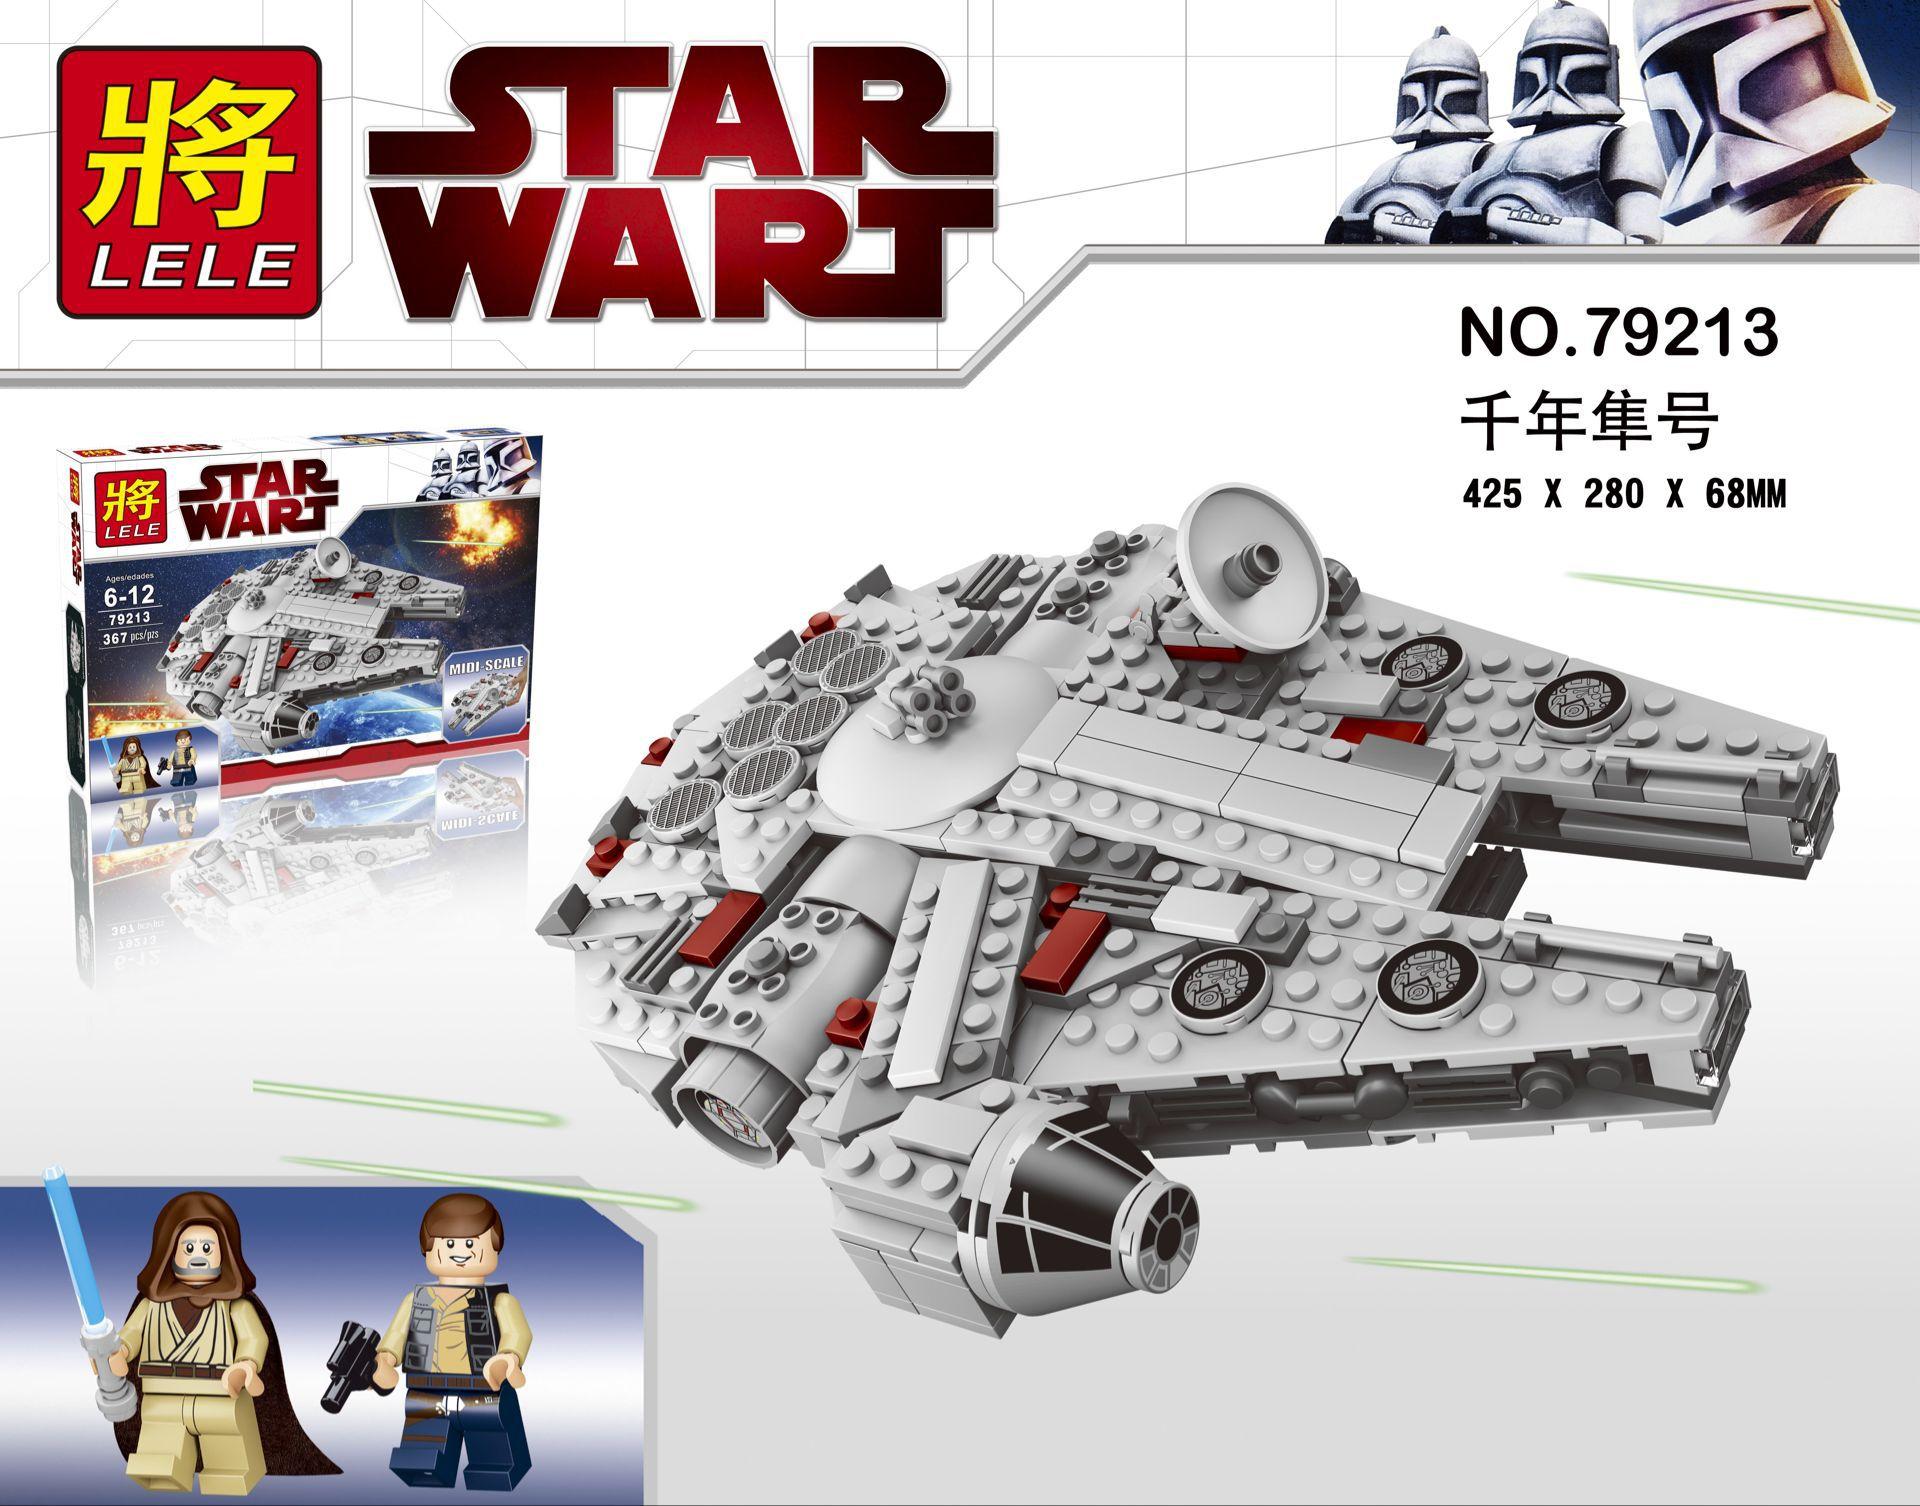 36 Star Wars First Order Millennium Falcon Fighter building blocks DIY Toys minifigures Model Bricks Best Gift